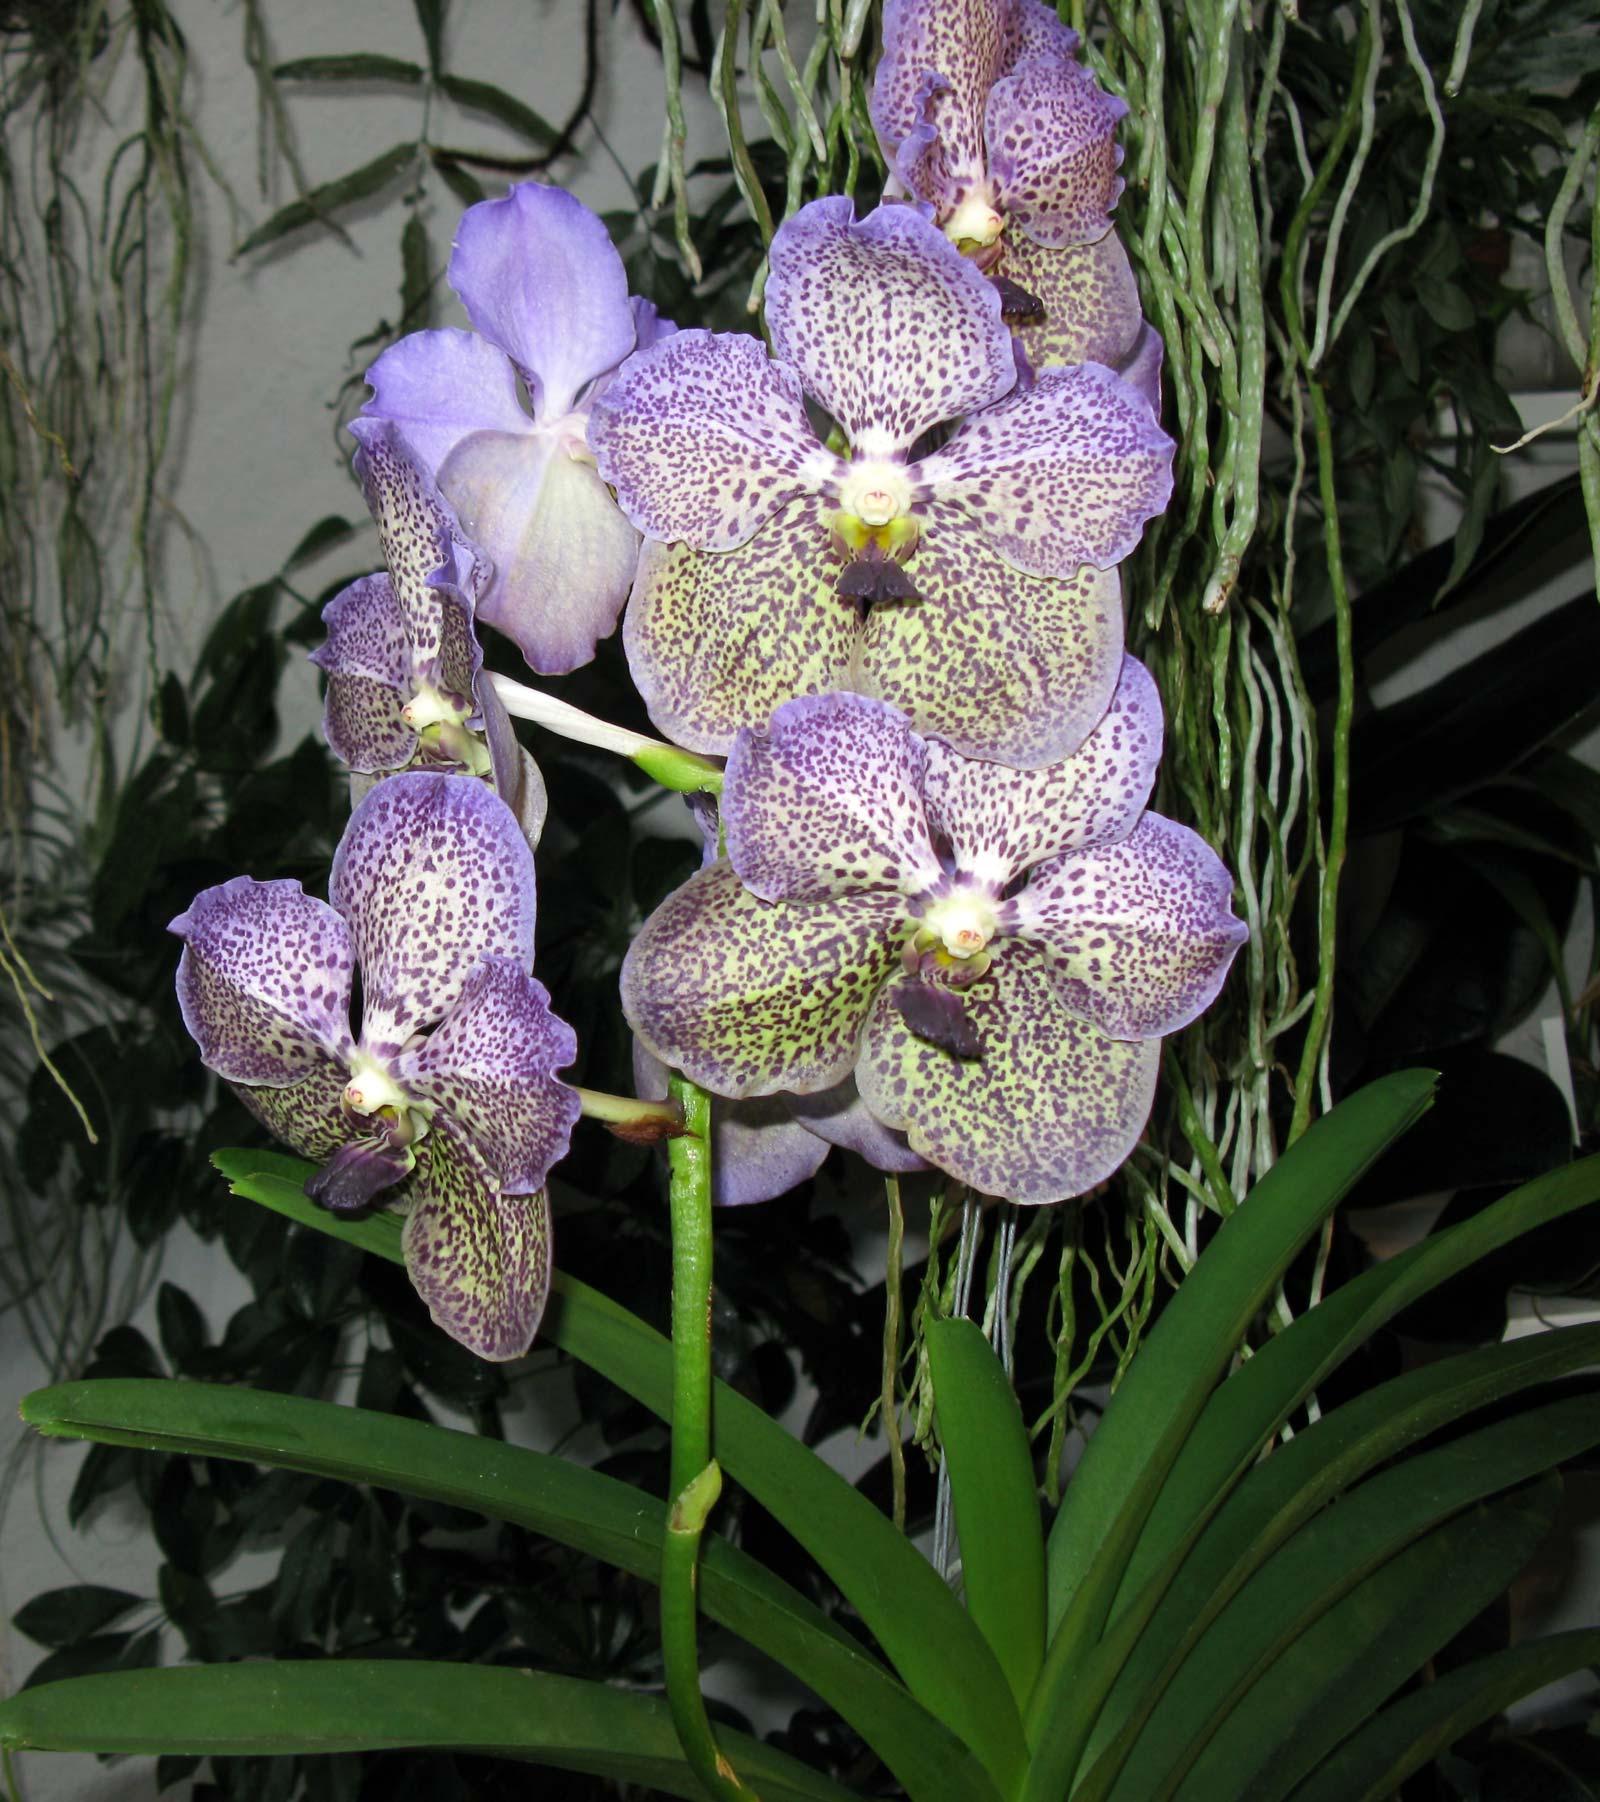 vanda moonlight blue gro r schener orchideen. Black Bedroom Furniture Sets. Home Design Ideas